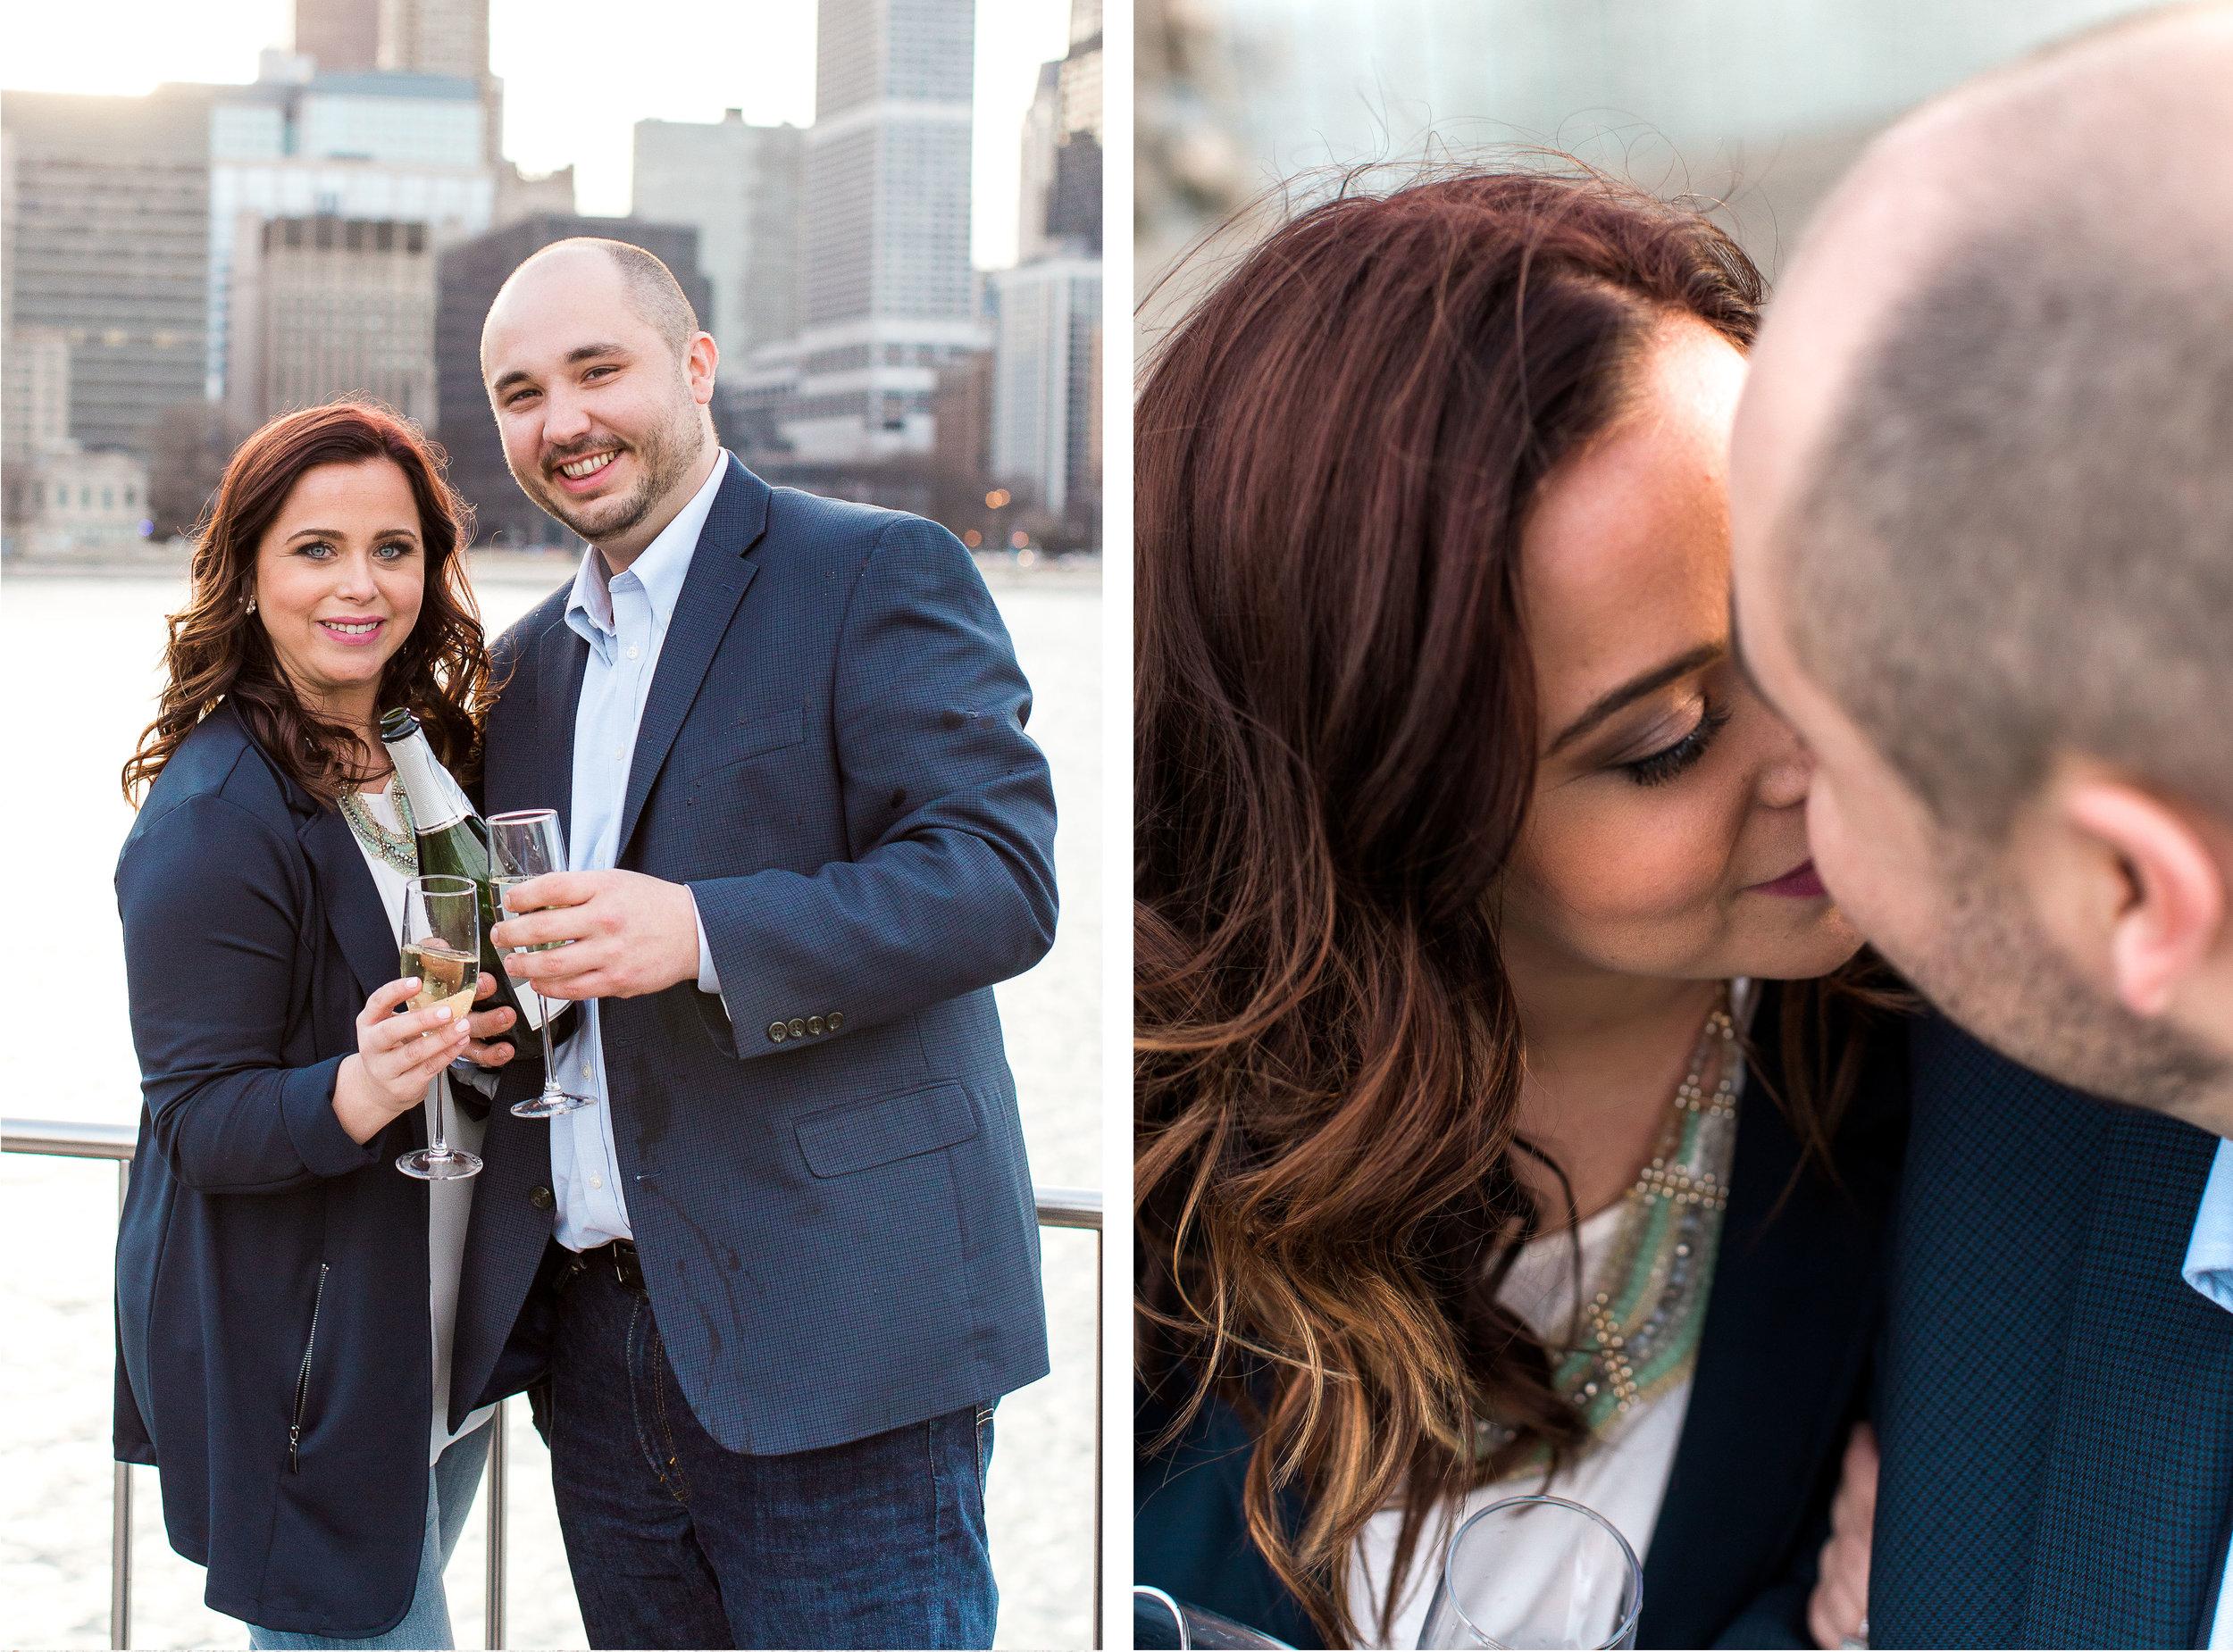 chicago-engagement-photographer-classy-olive-park-downtown-wedding-kristen-cloyd-65.jpg